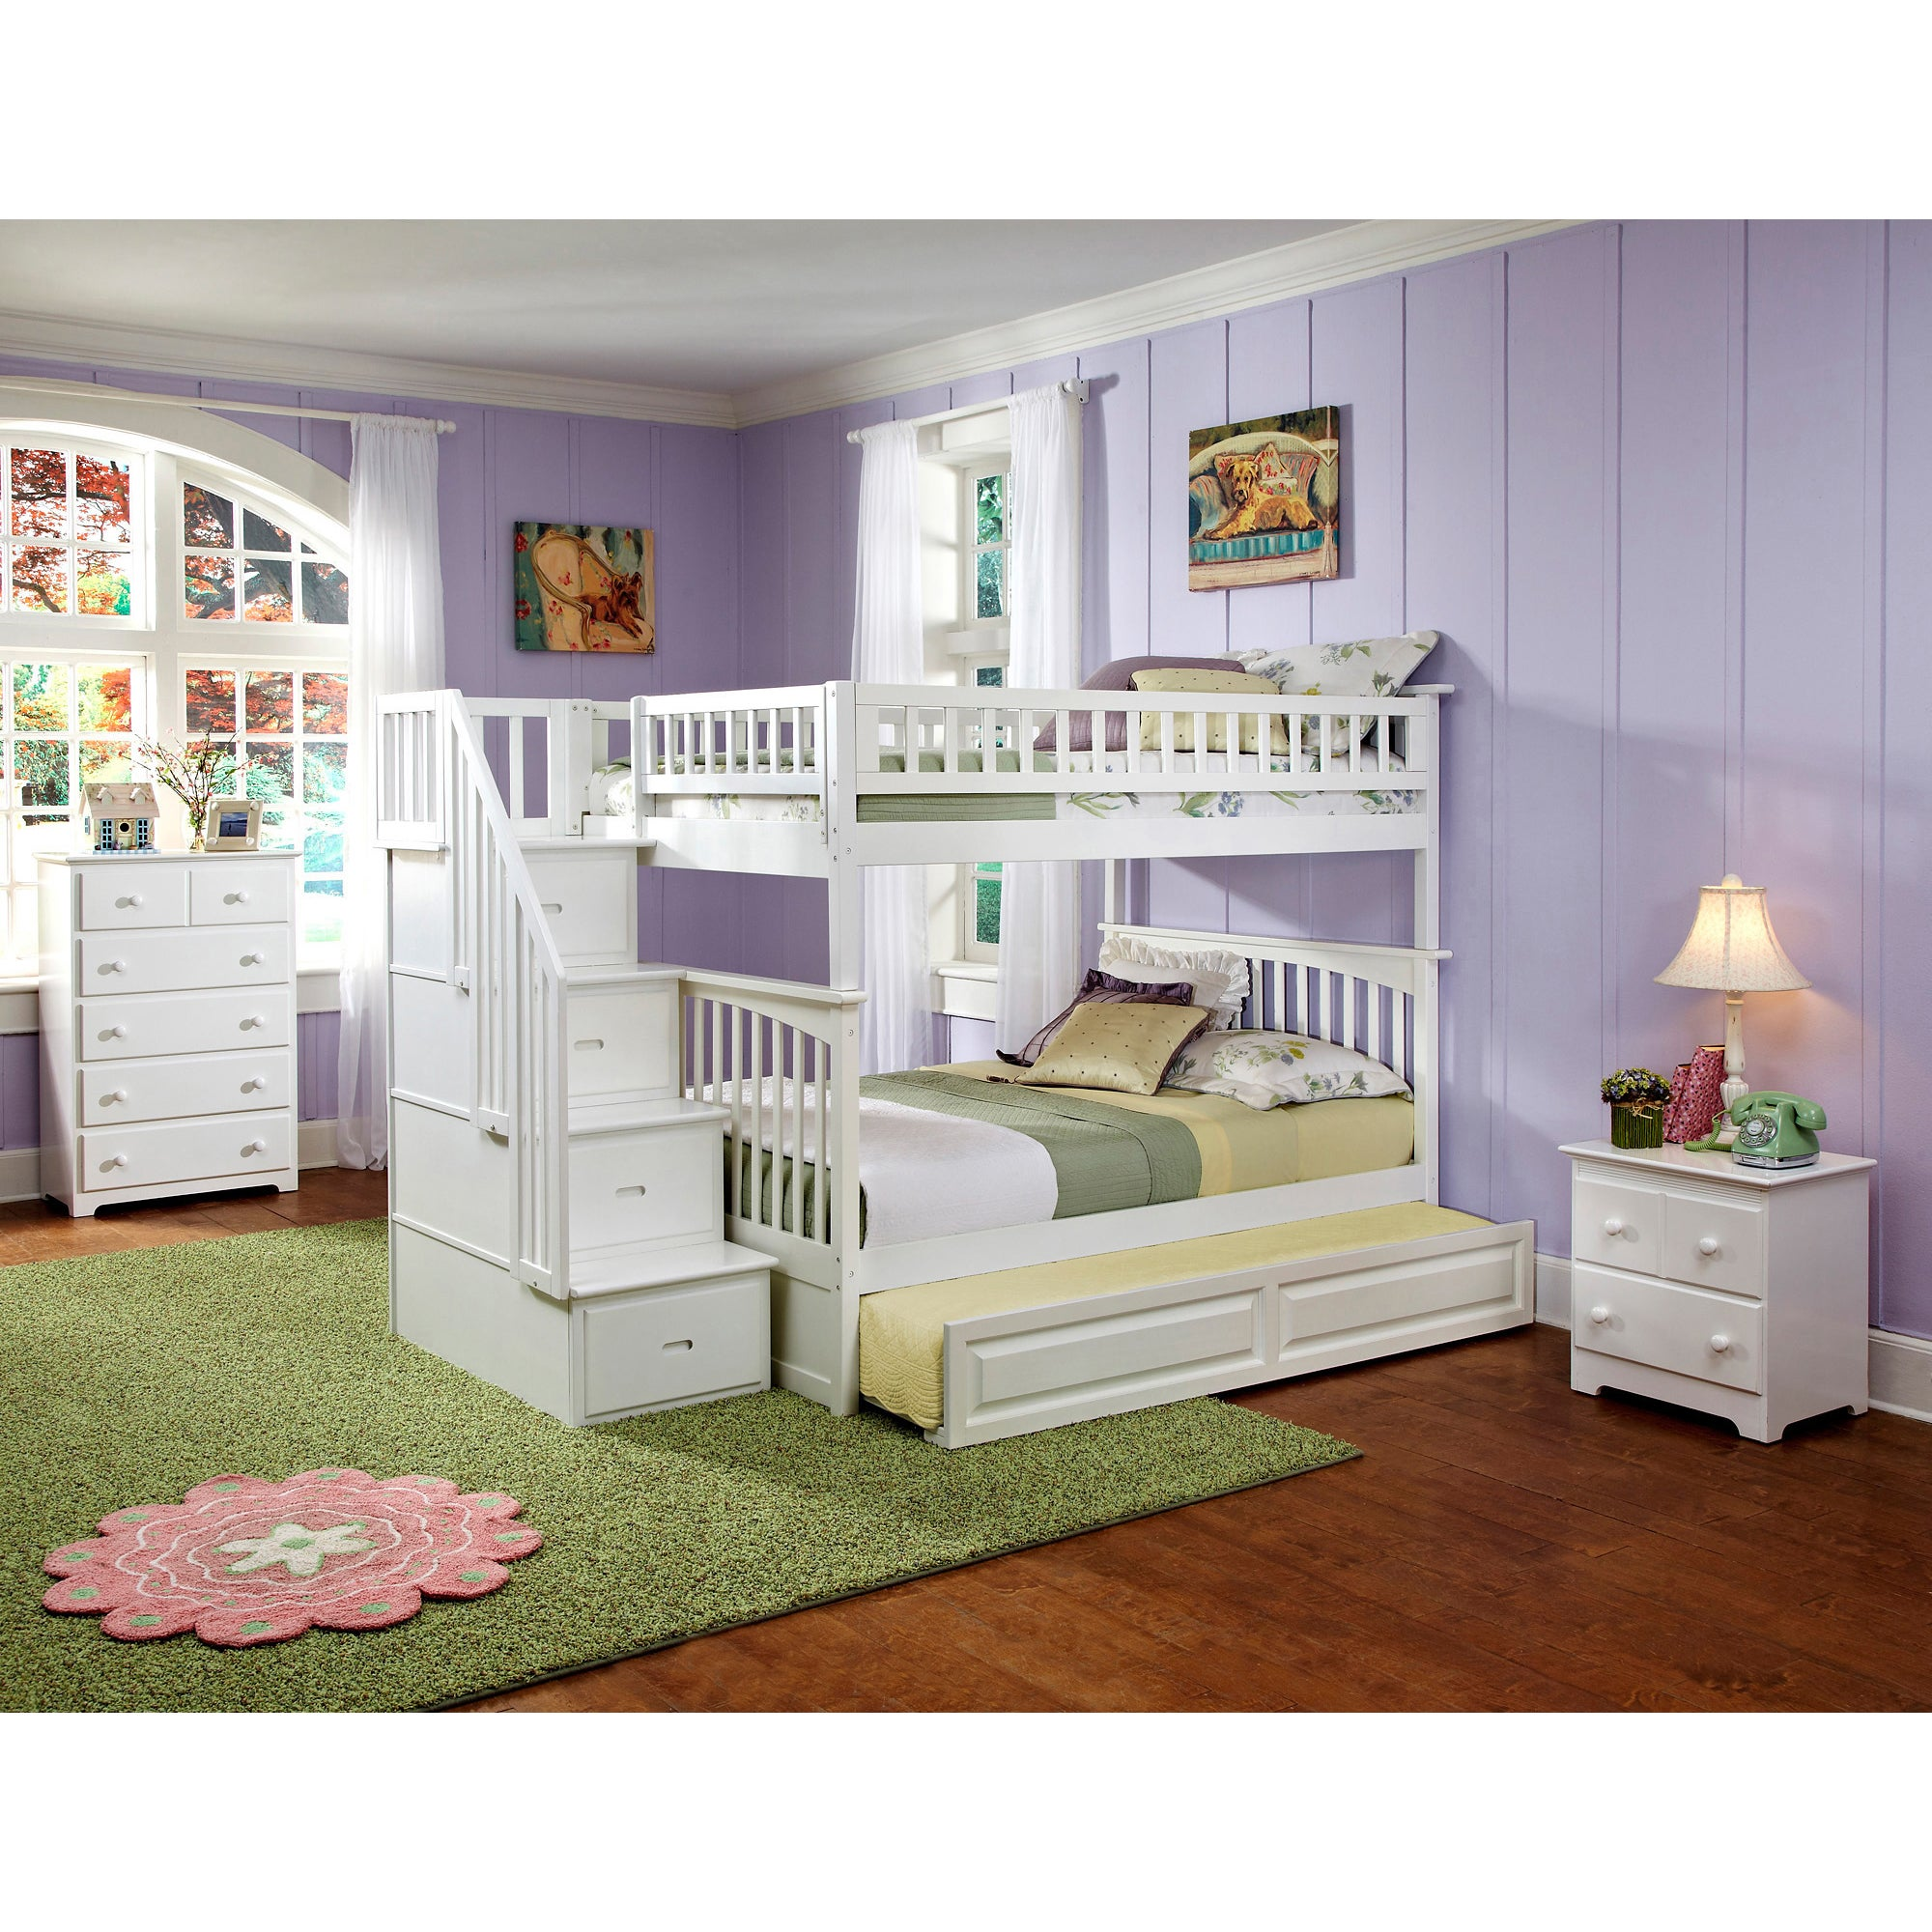 Buy Kids\' & Toddler Beds Online at Overstock.com | Our Best Kids ...